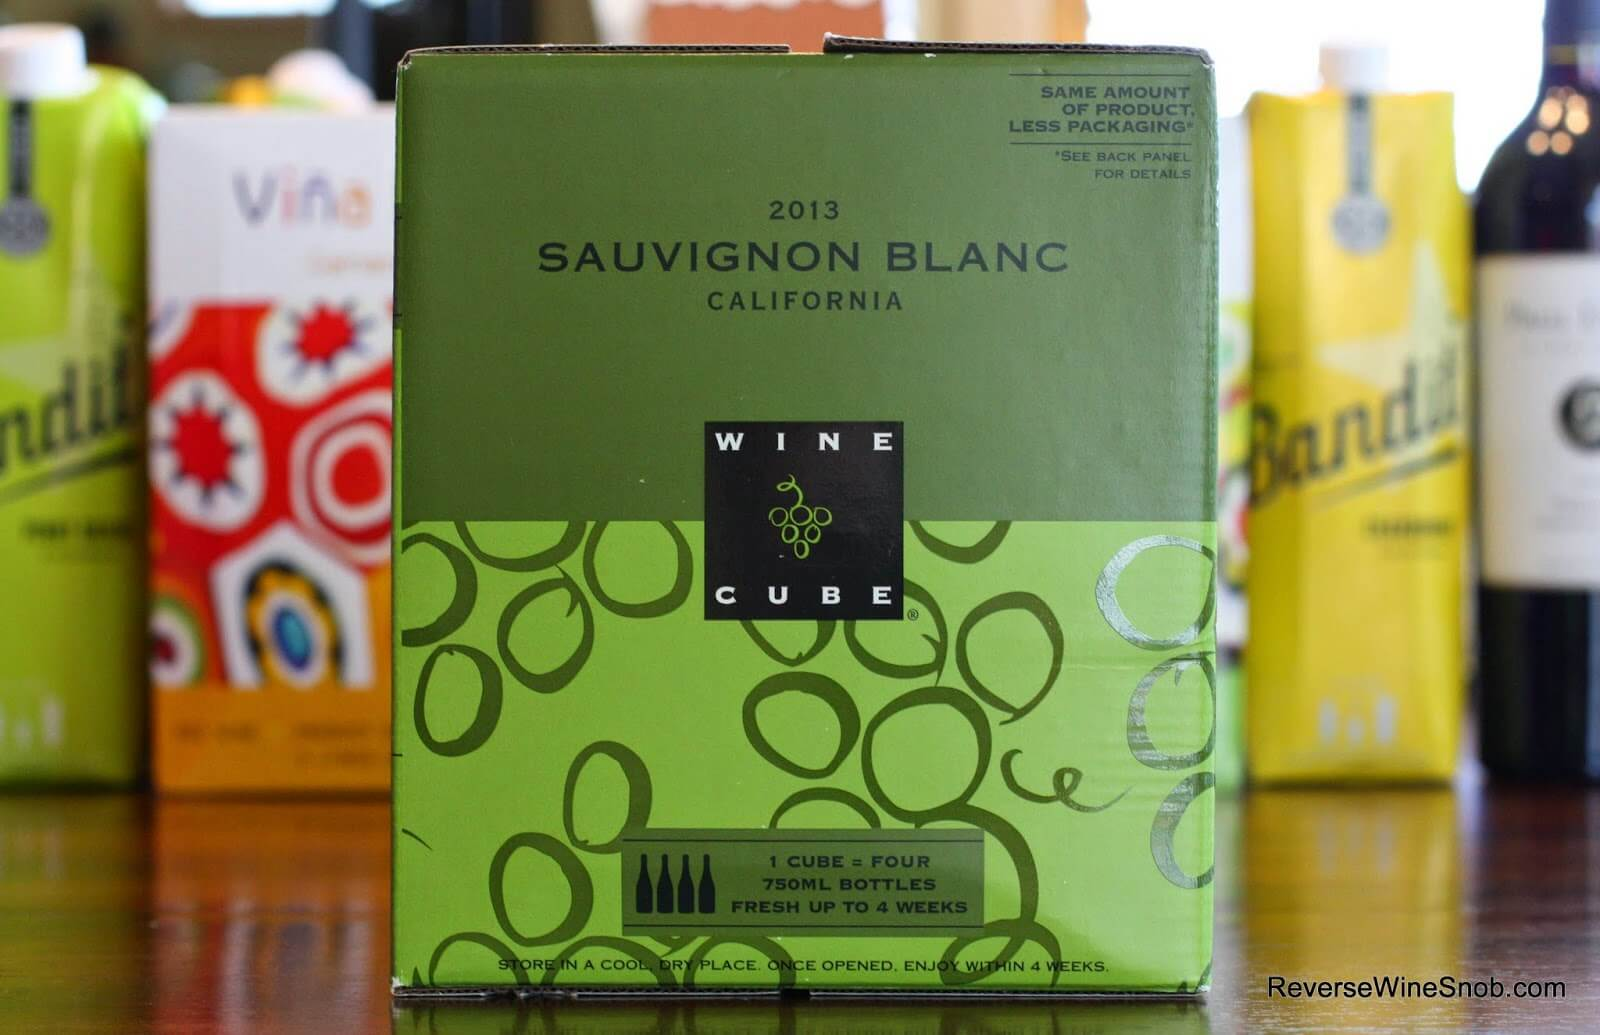 2013-Target-Wine-Cube-Sauvignon-Blanc